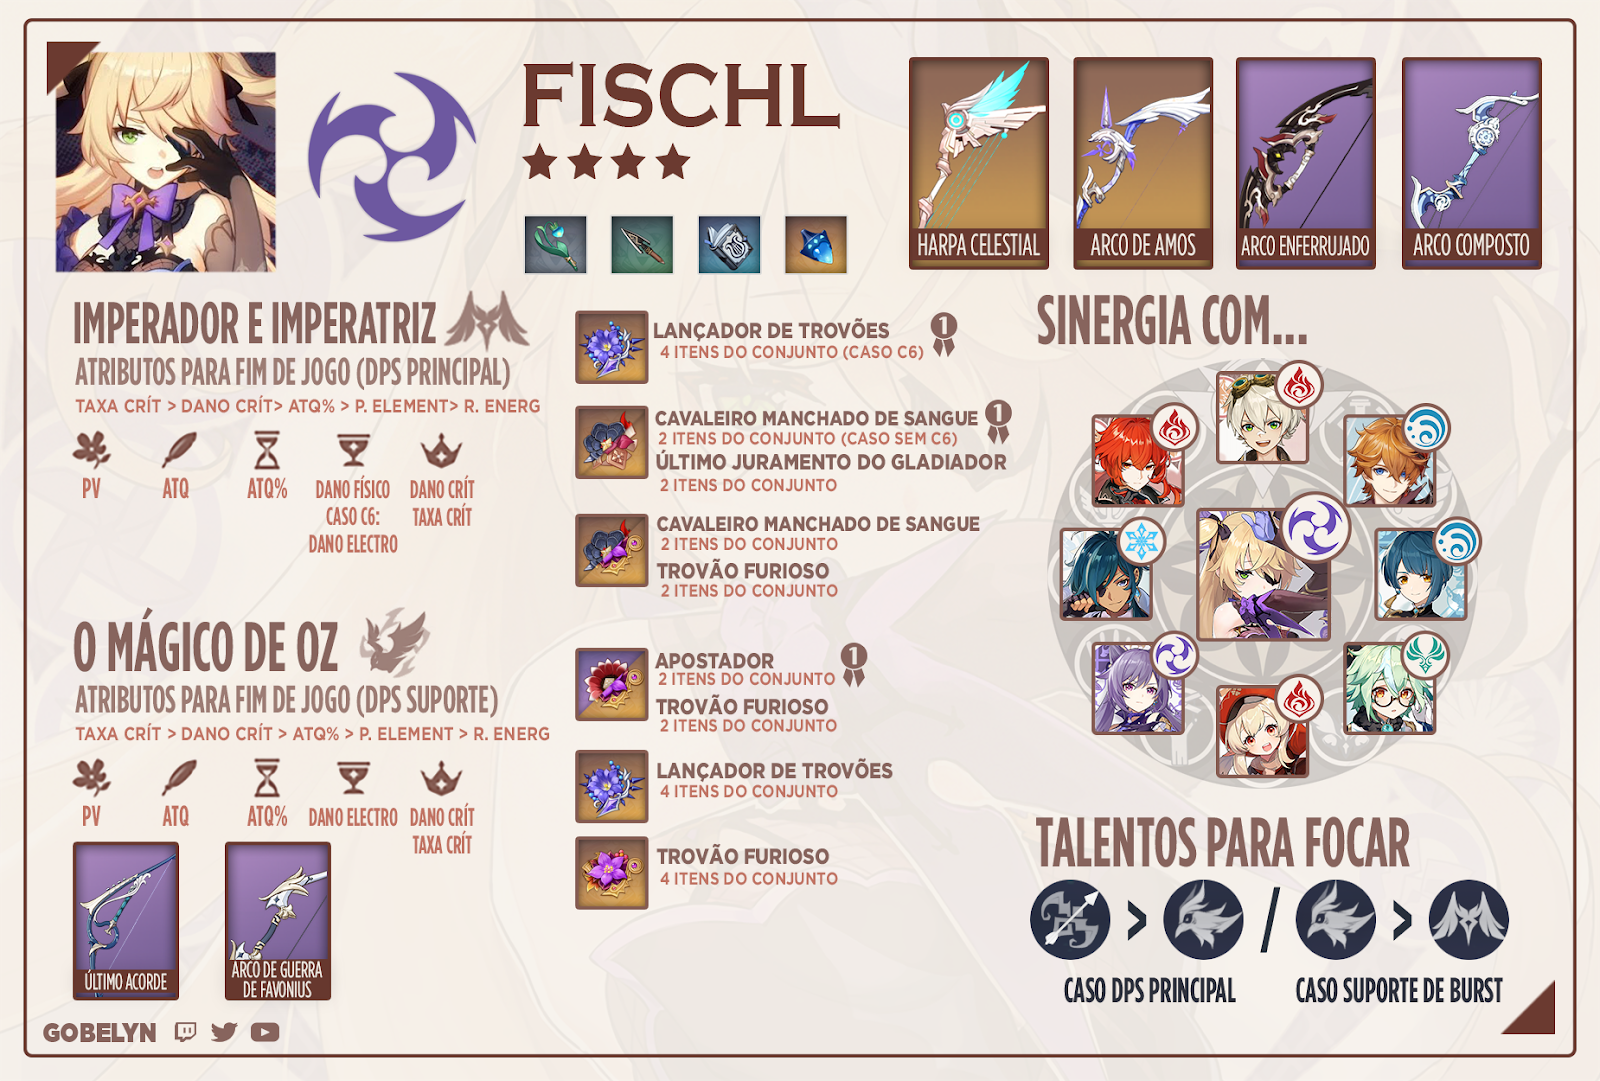 fischl genshin impact gobelyn portugues